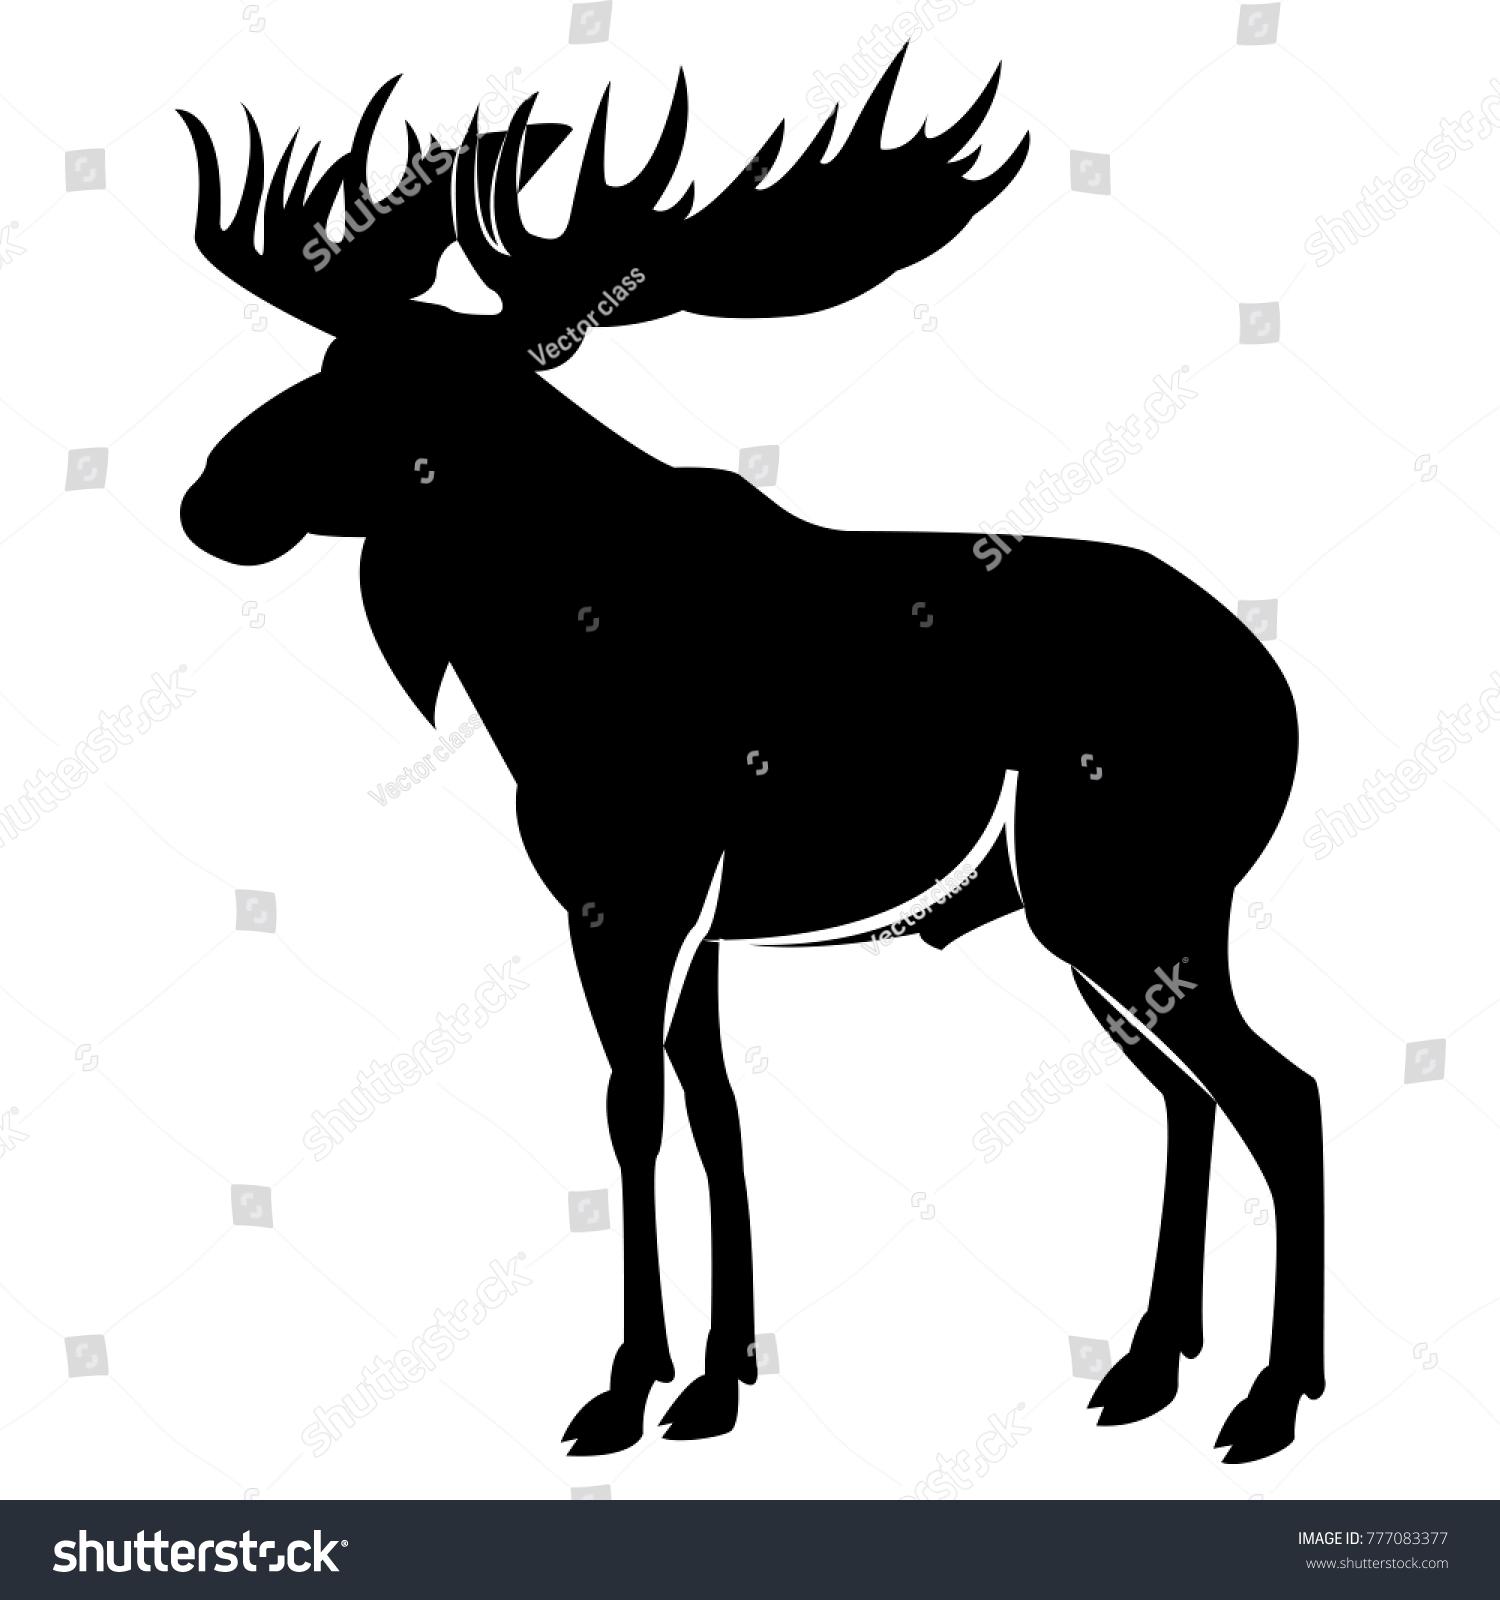 Elk silhouette vector